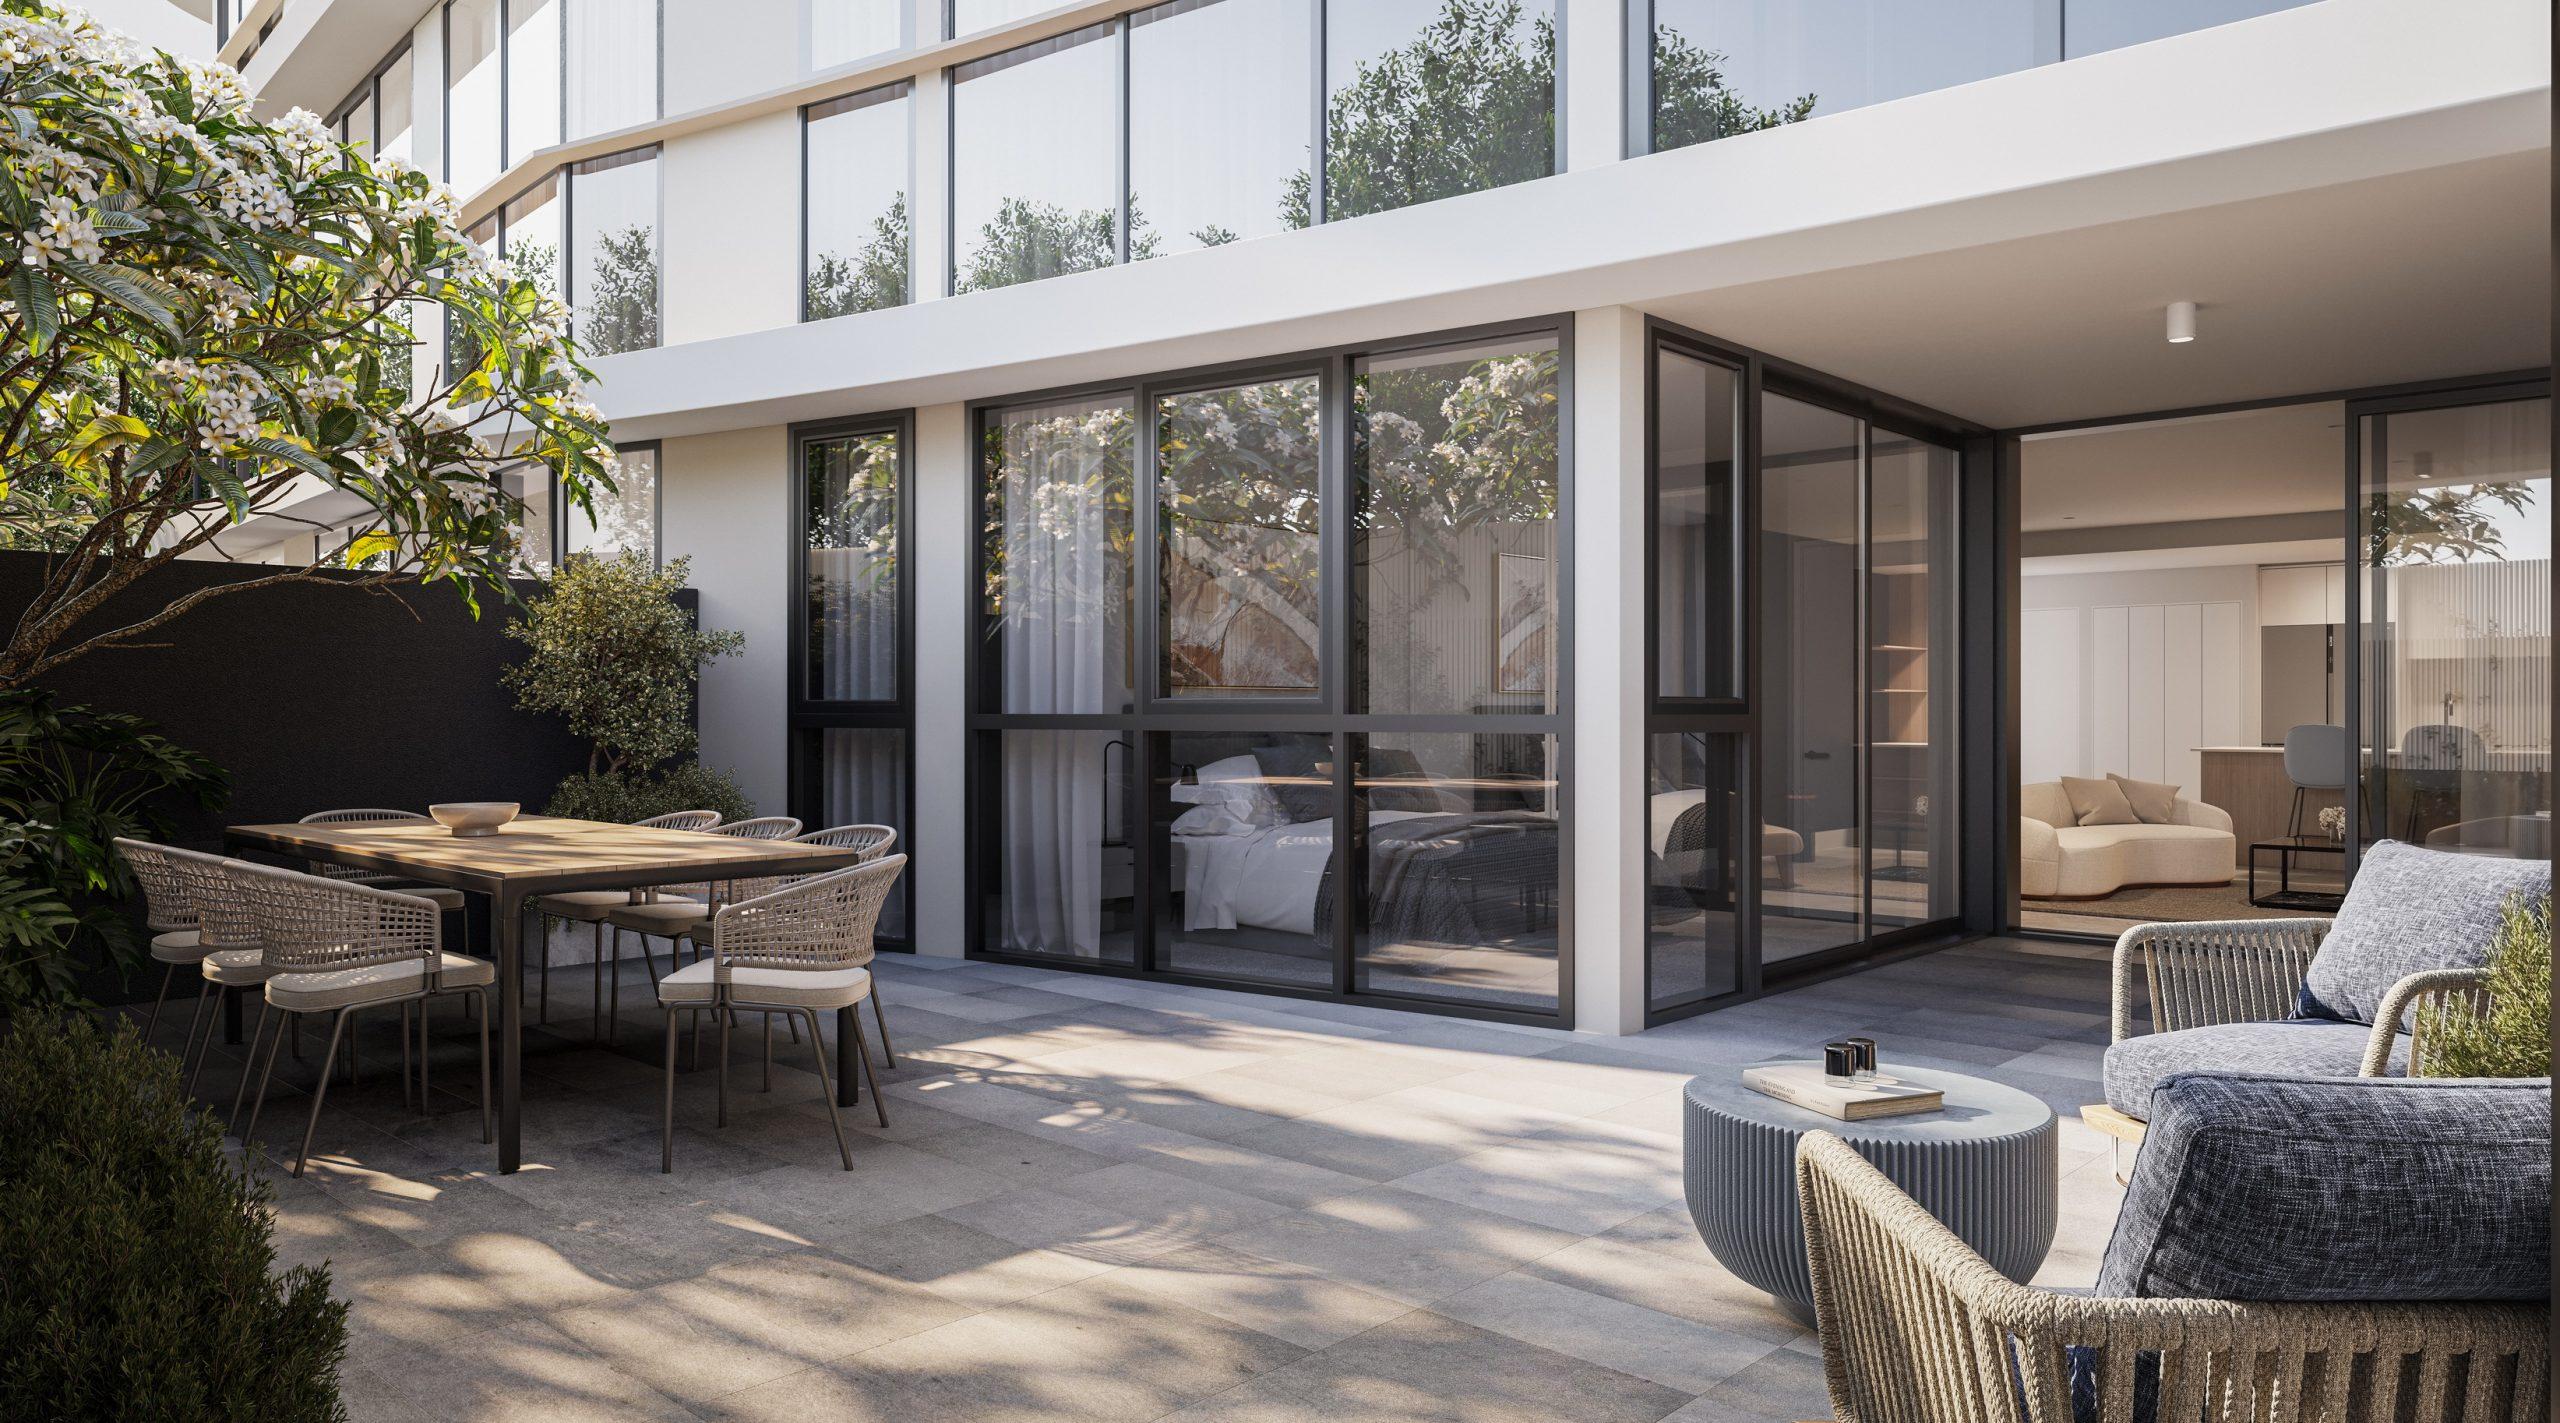 Rivello-queensland-render-3d-fkd-studio-architecture-luxury-design-terrace